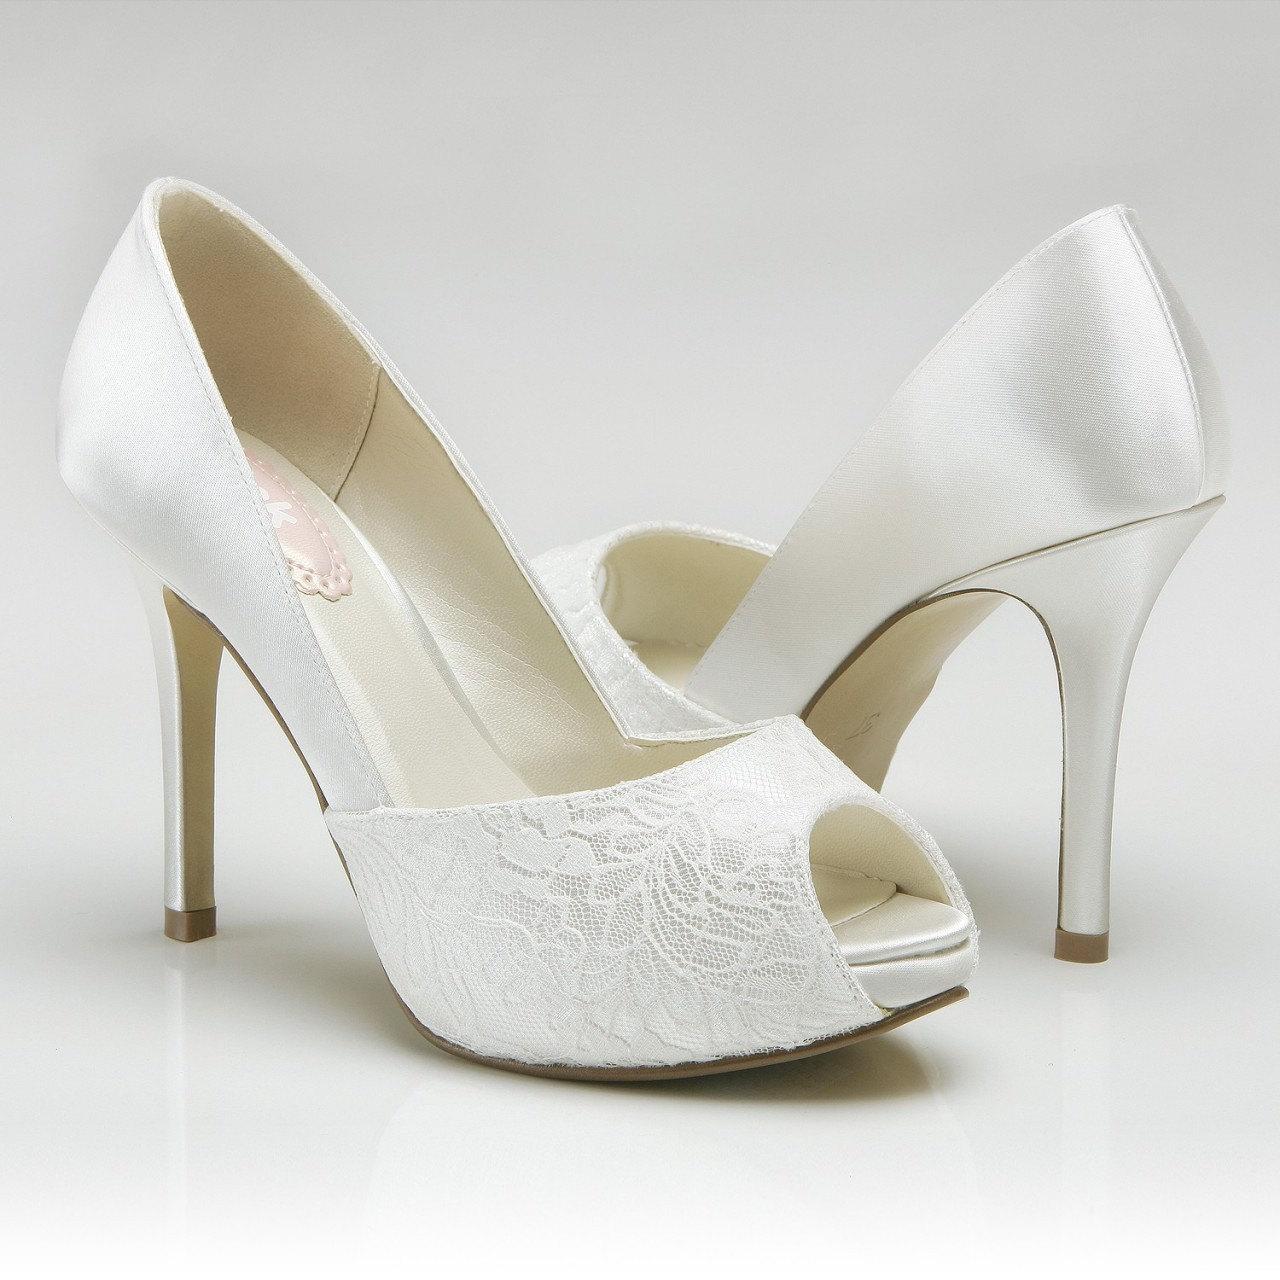 Women s Wedding Shoes  FREE Custom Color Service  Brides  baf5d0f1c74e